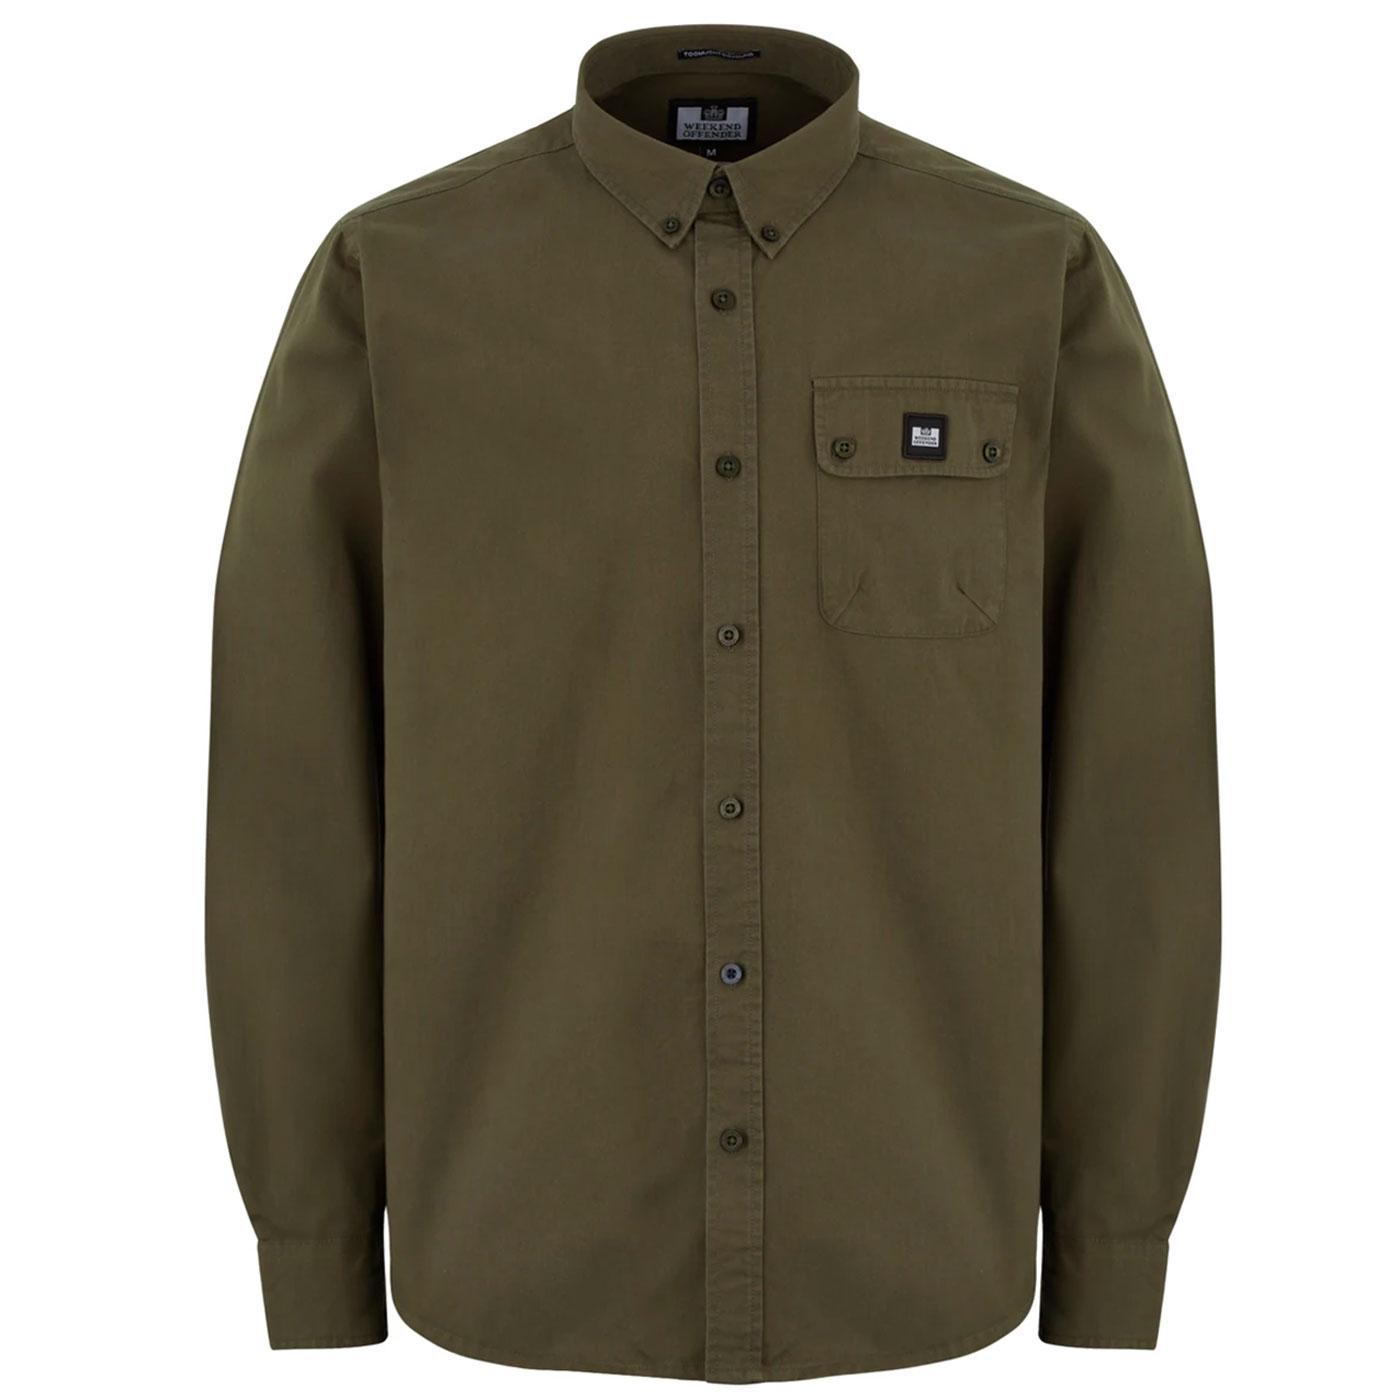 Postiano WEEKEND OFFENDER Retro Ranger Shirt (DS)